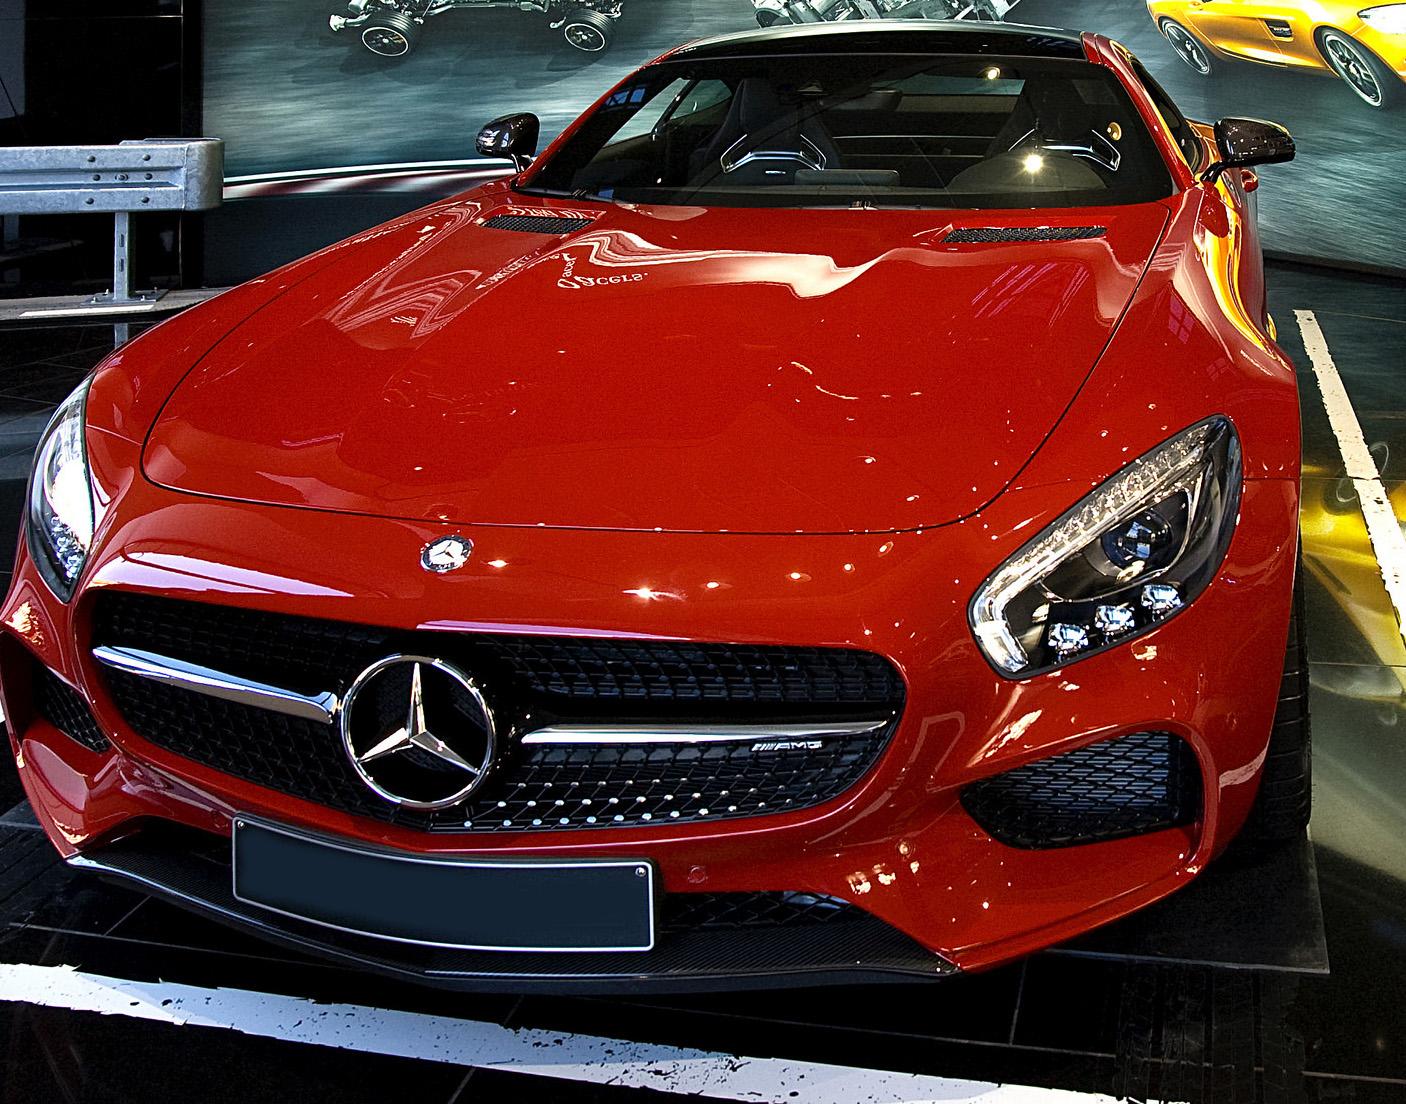 mercedes-shop-near-me - MBT of ATLANTA Mercedes Master Techs